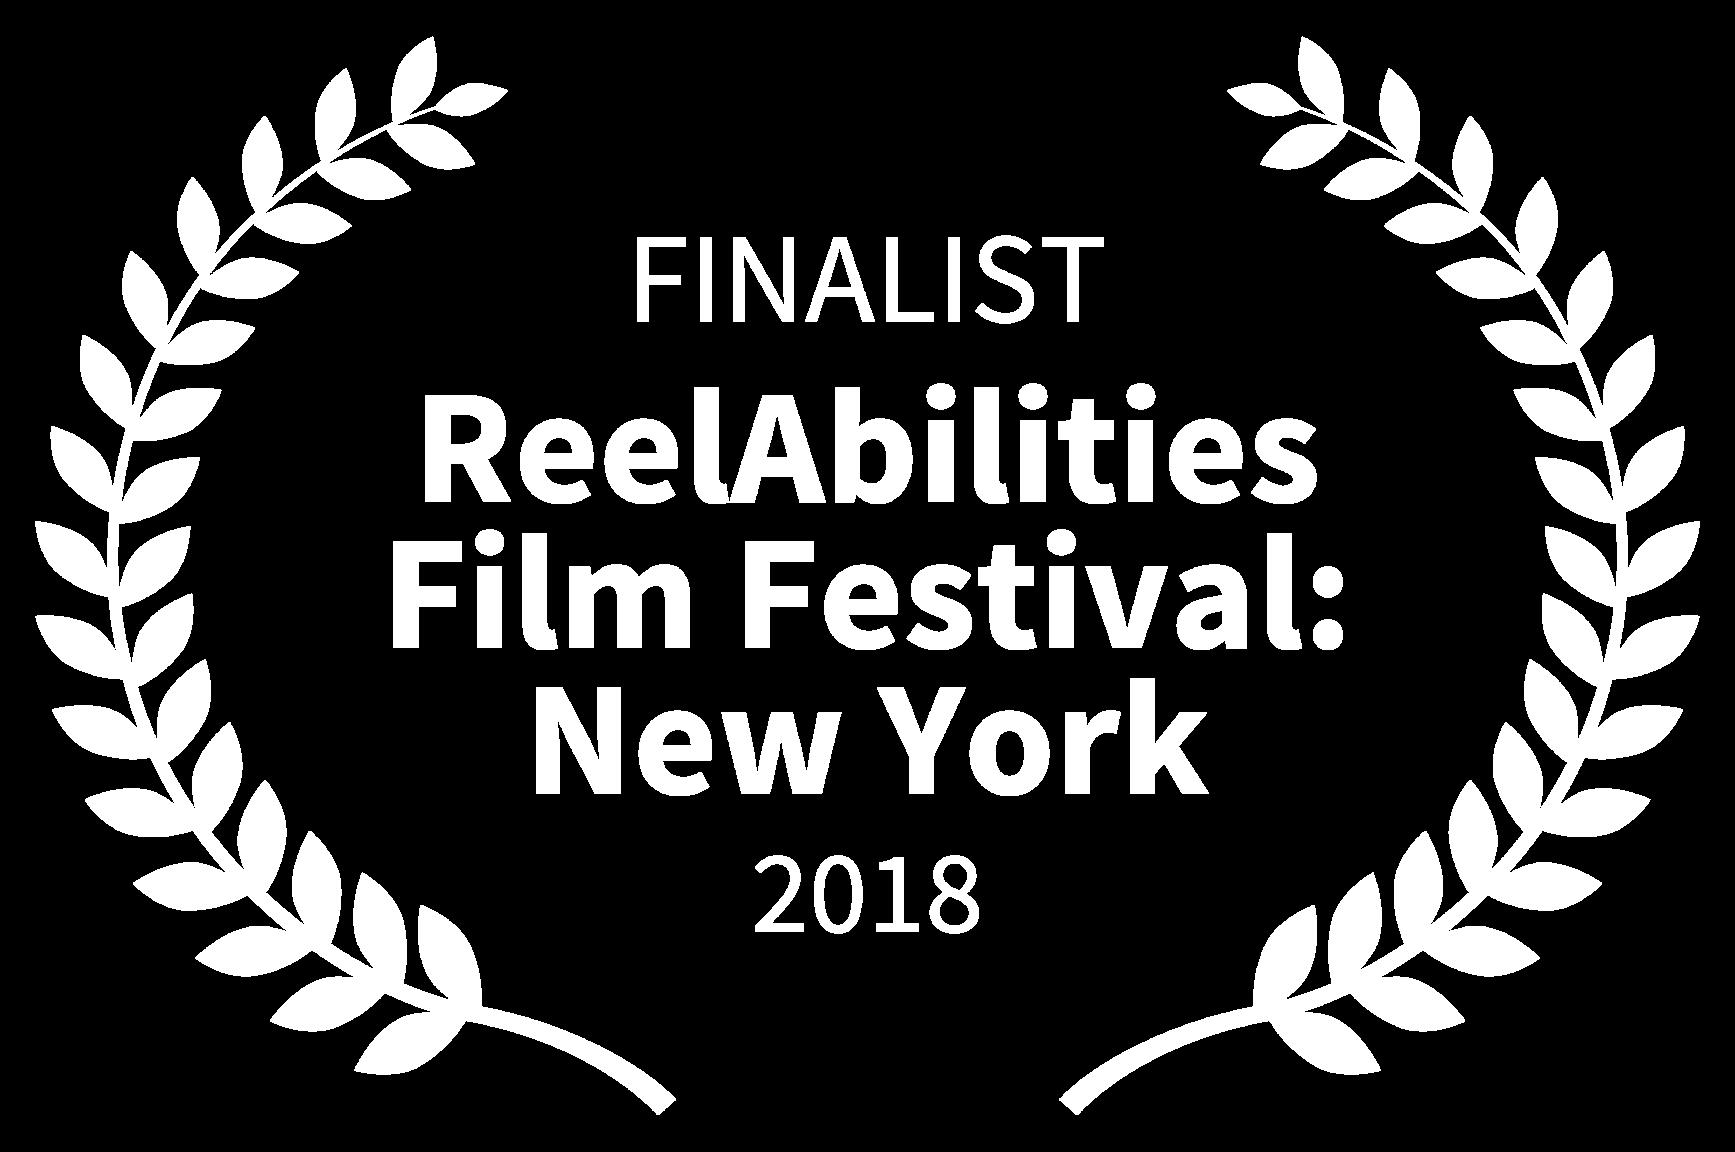 FINALIST - ReelAbilities Film Festival New York - 2018 (1).png